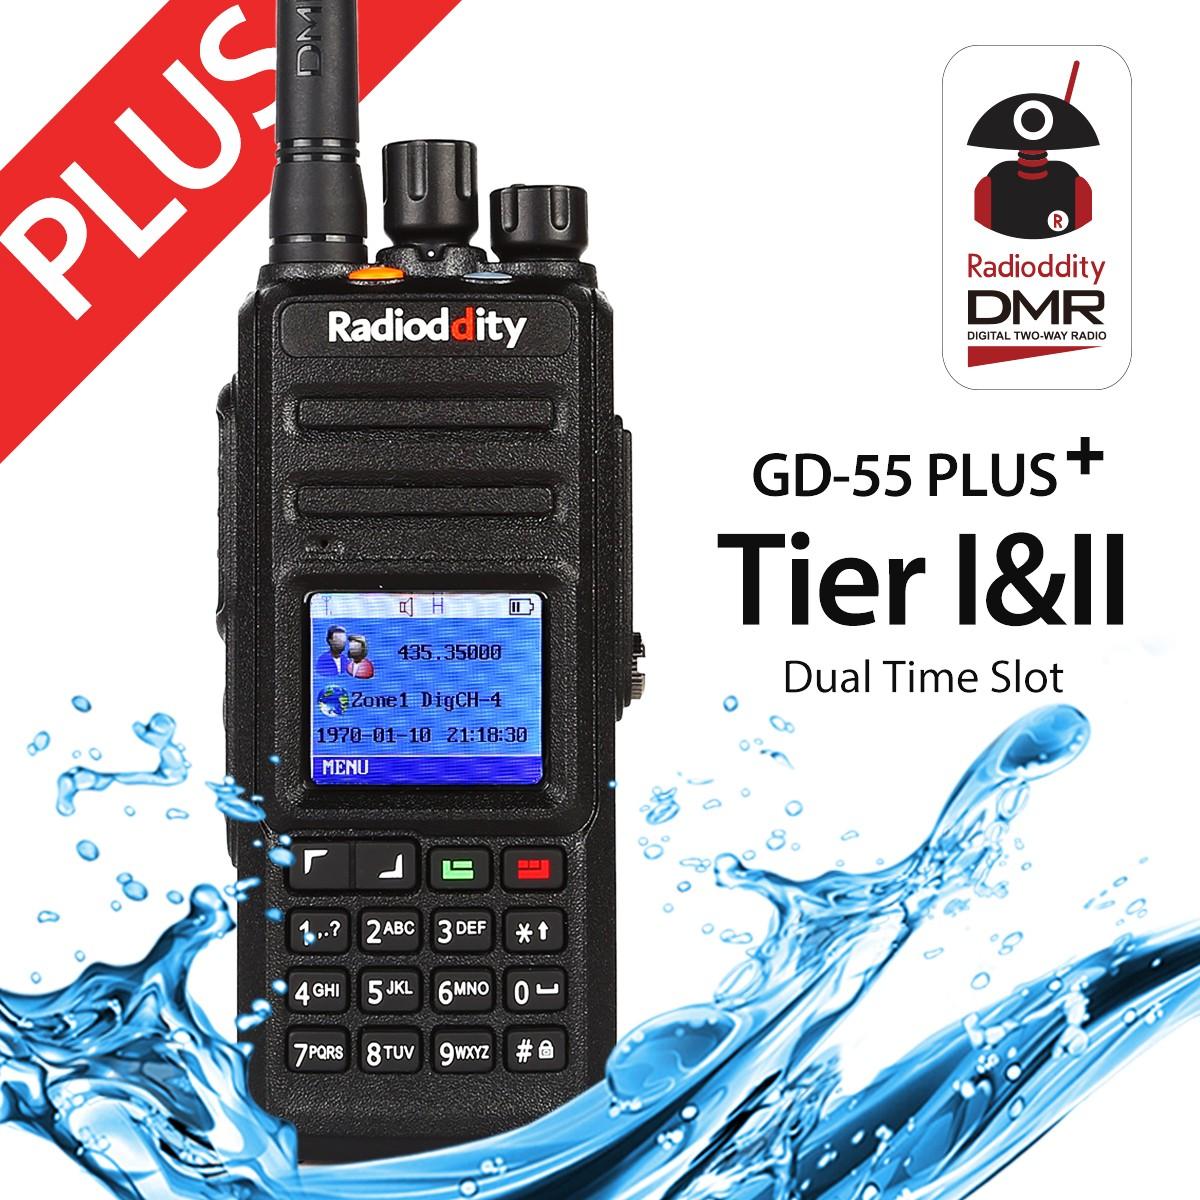 Radioddity GD-55 Plus UHF DMR Digital Radio+ 2800mAh Battery Mototrbo Tier I&II